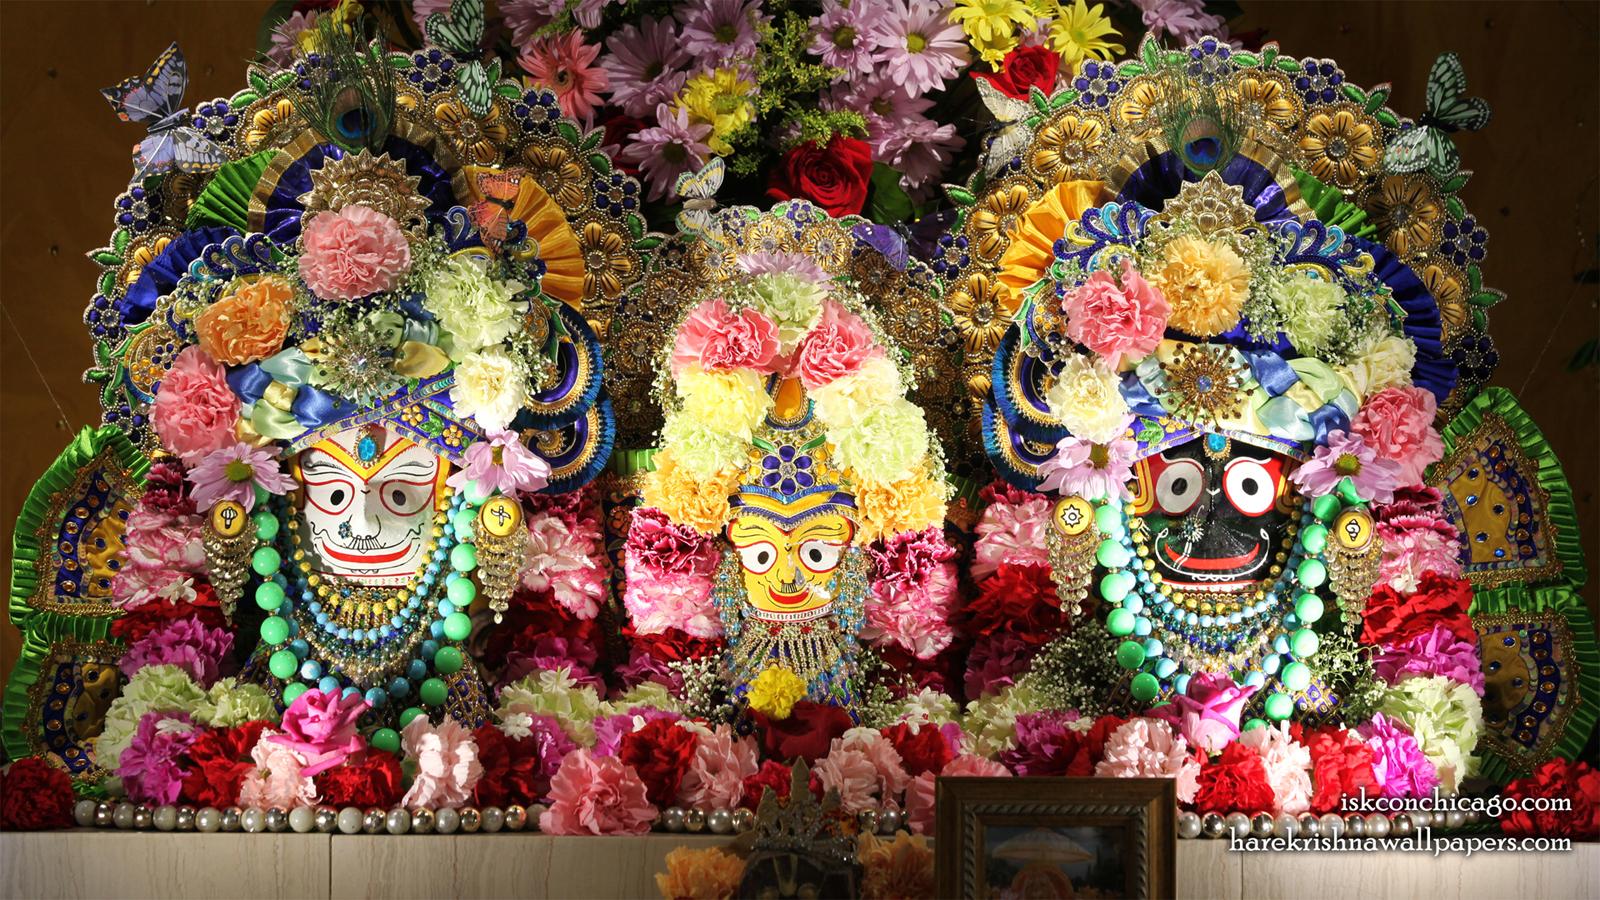 Jagannath Baladeva Subhadra Wallpaper (008) Size 1600x900 Download